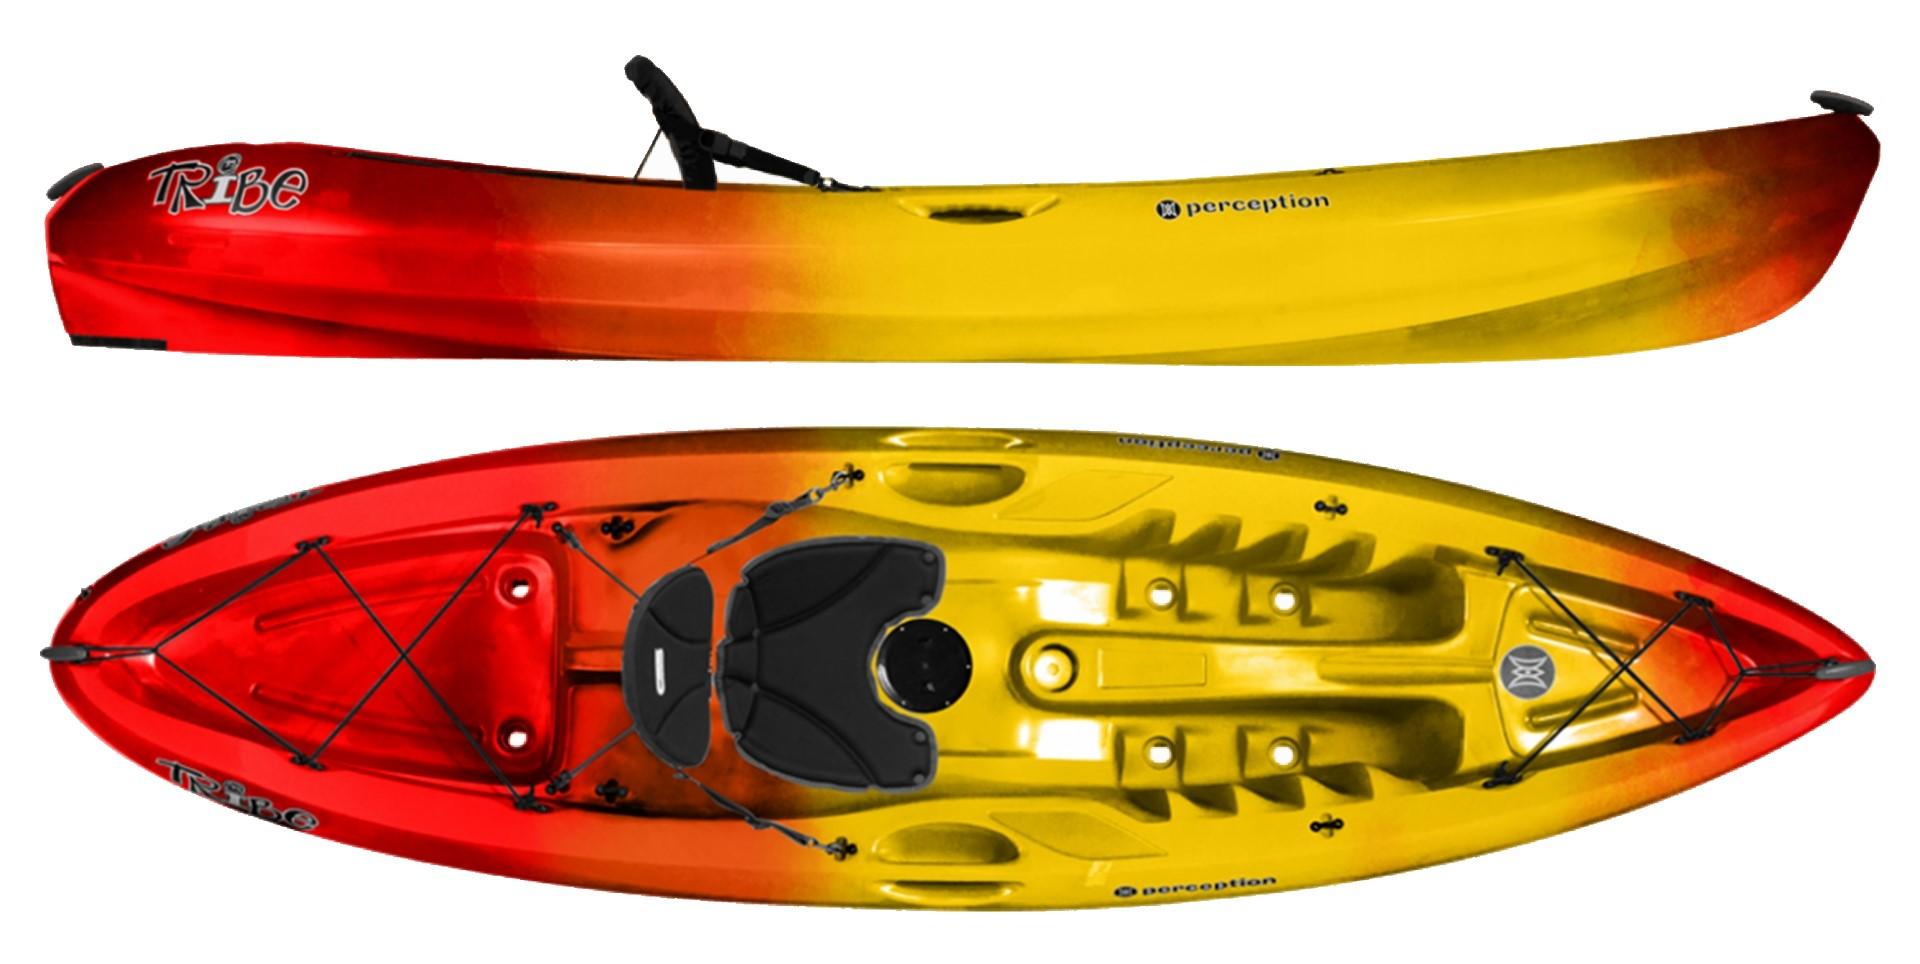 kayak-city-perception-tribe-9.5.jpg